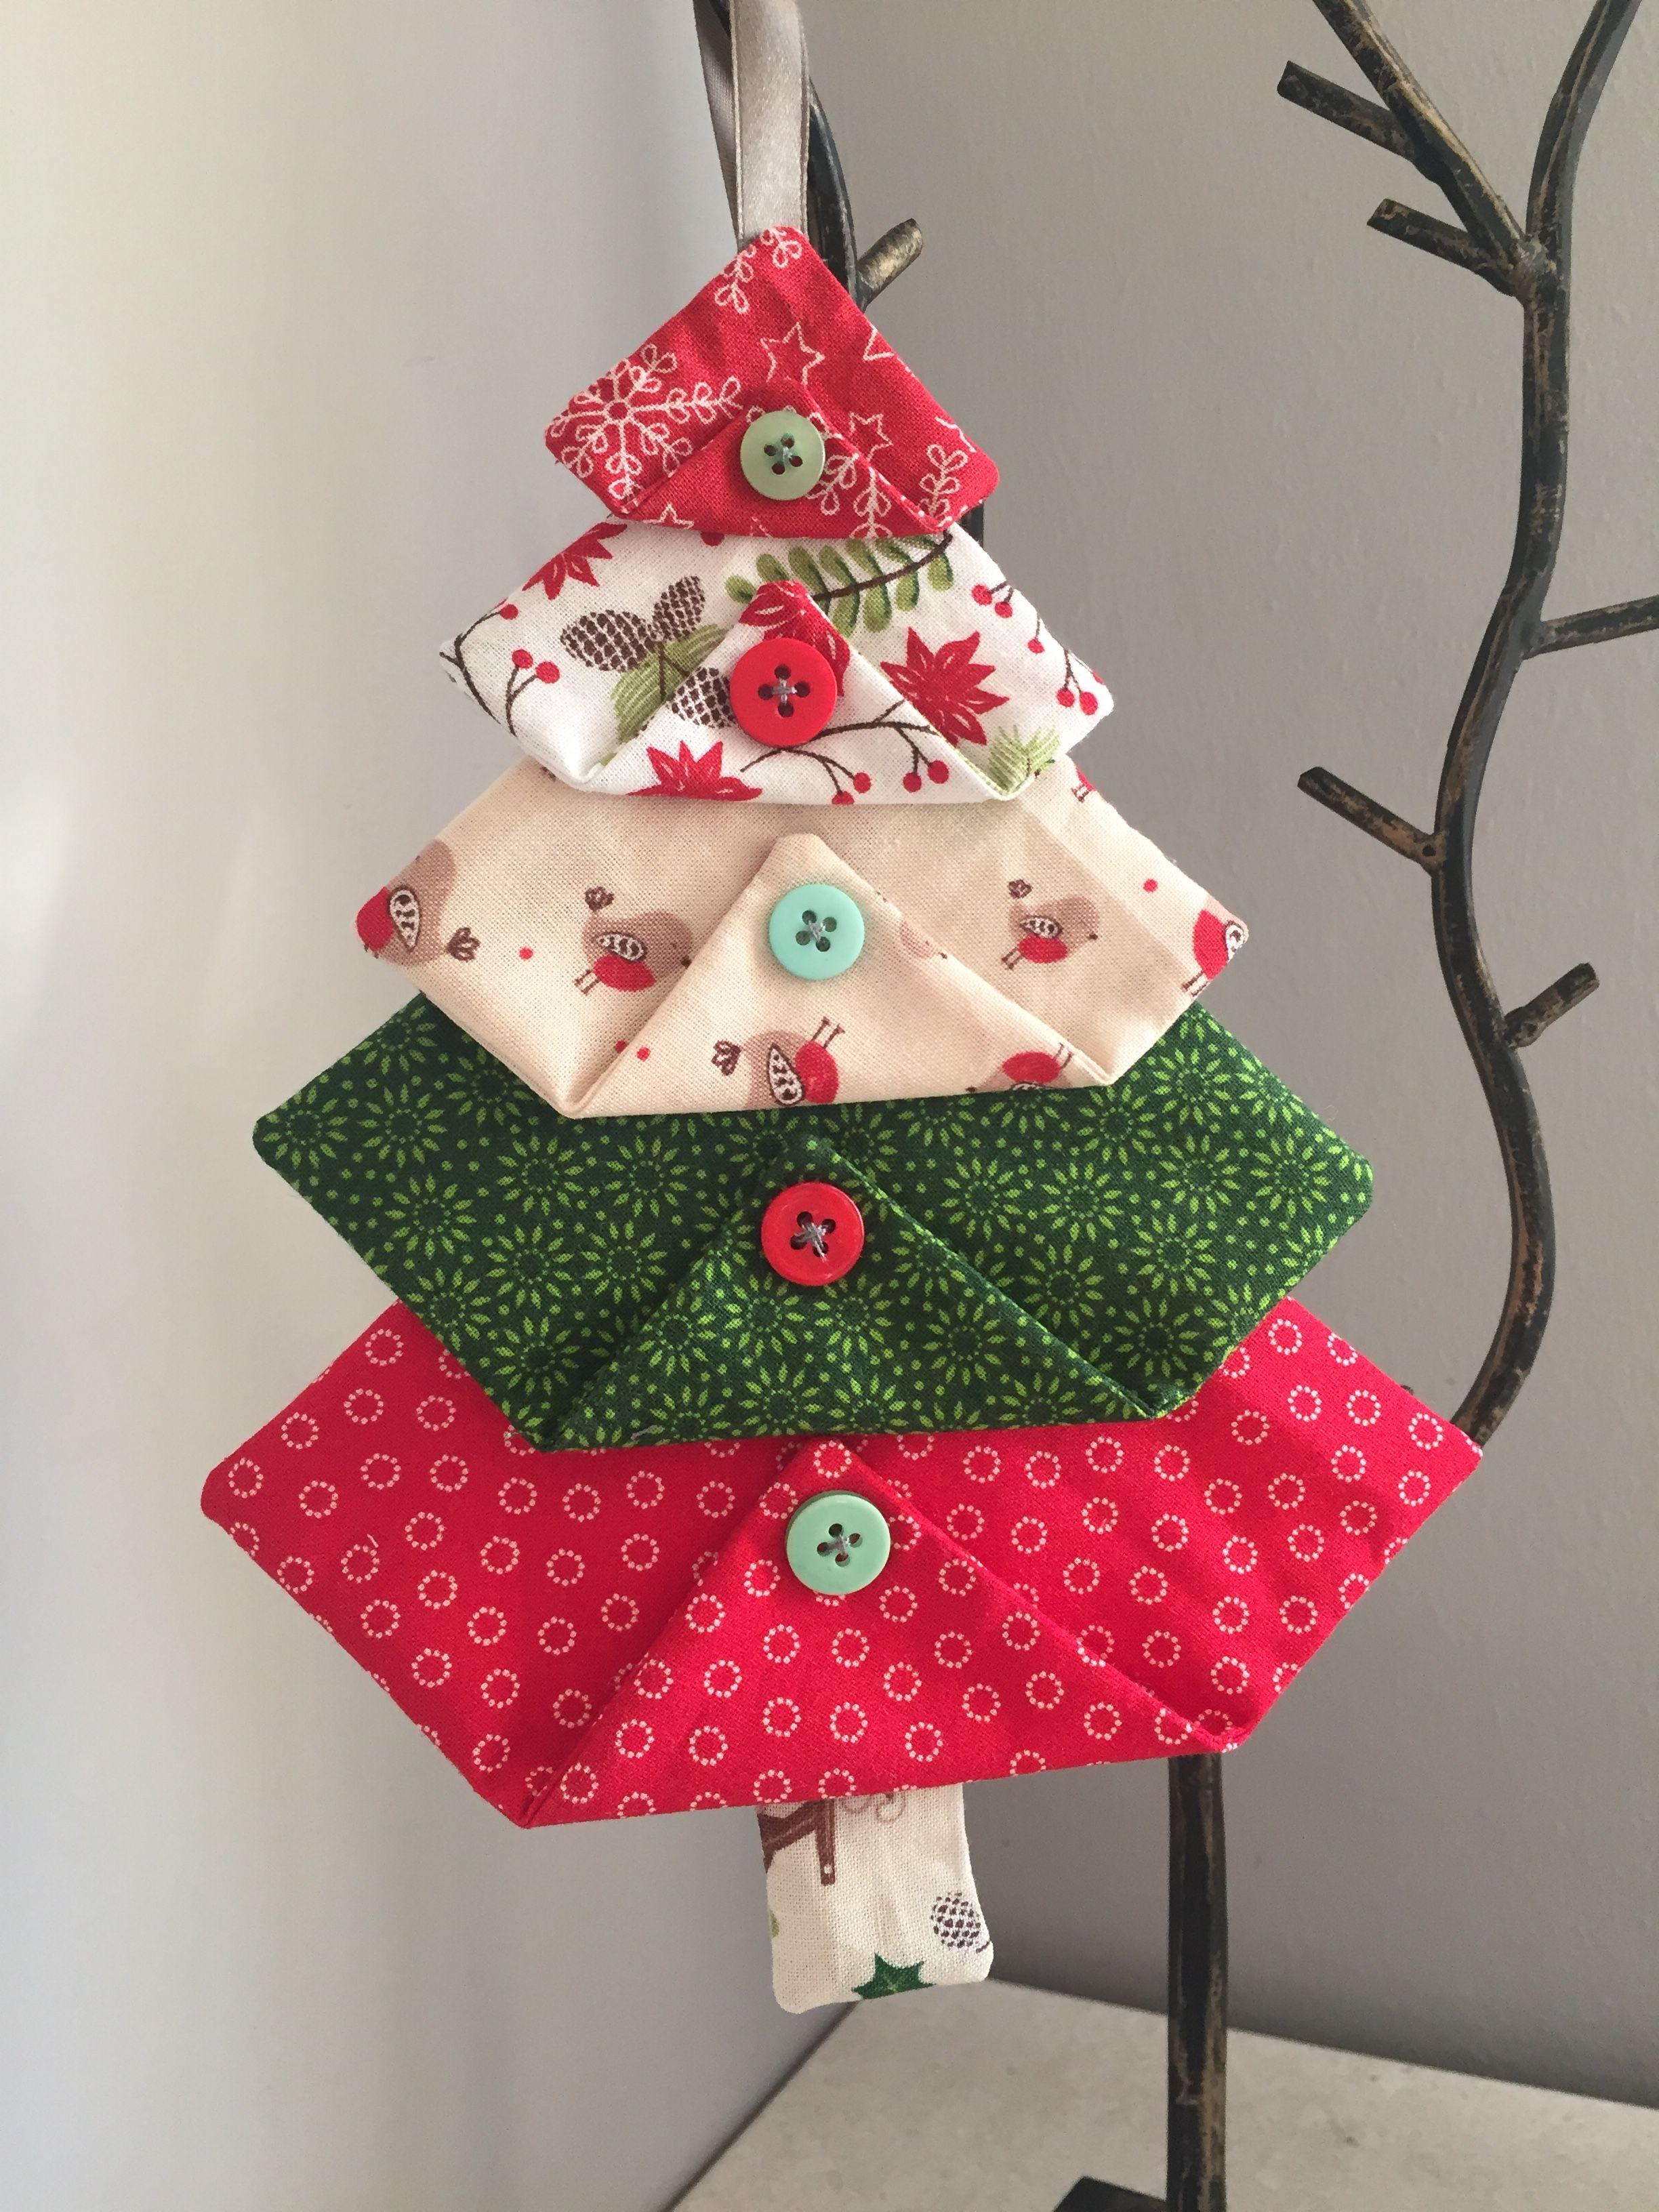 3 D Pyramid Christmas Tree Craft Christmas Crafts Christmas Tree Crafts Xmas Crafts